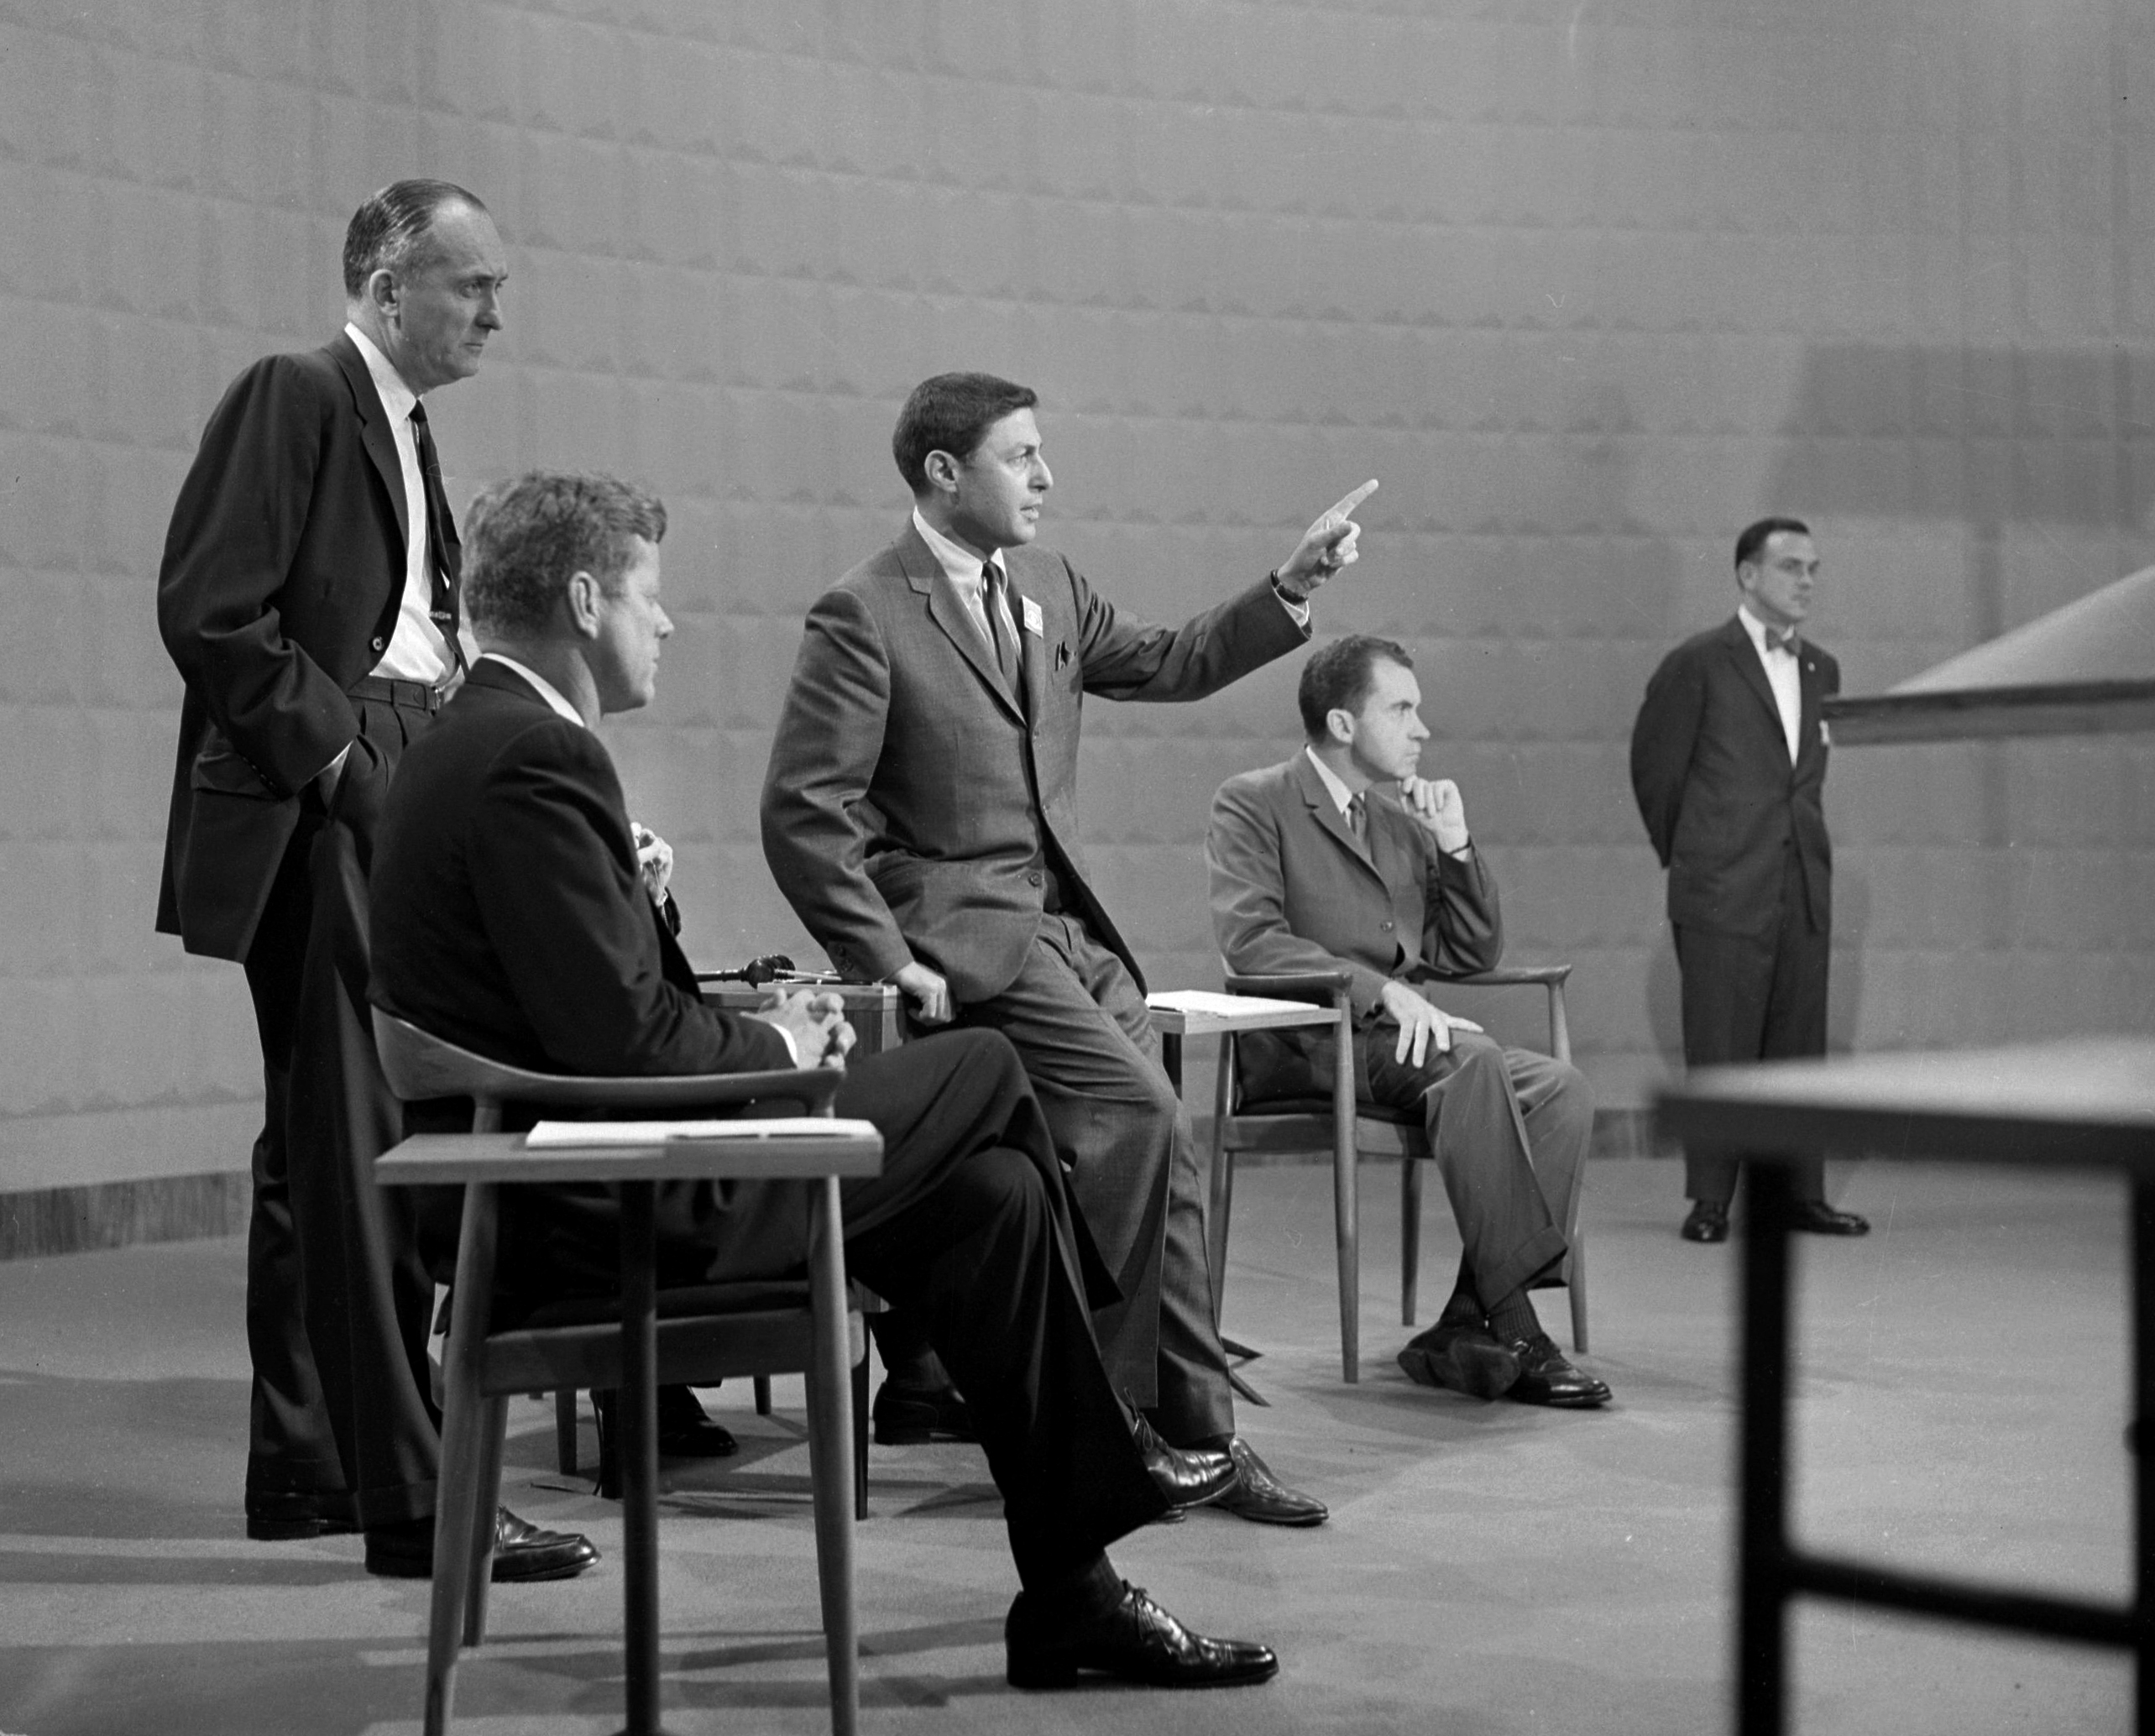 Presidential debates: some background | Prof Chris Daly's Blog